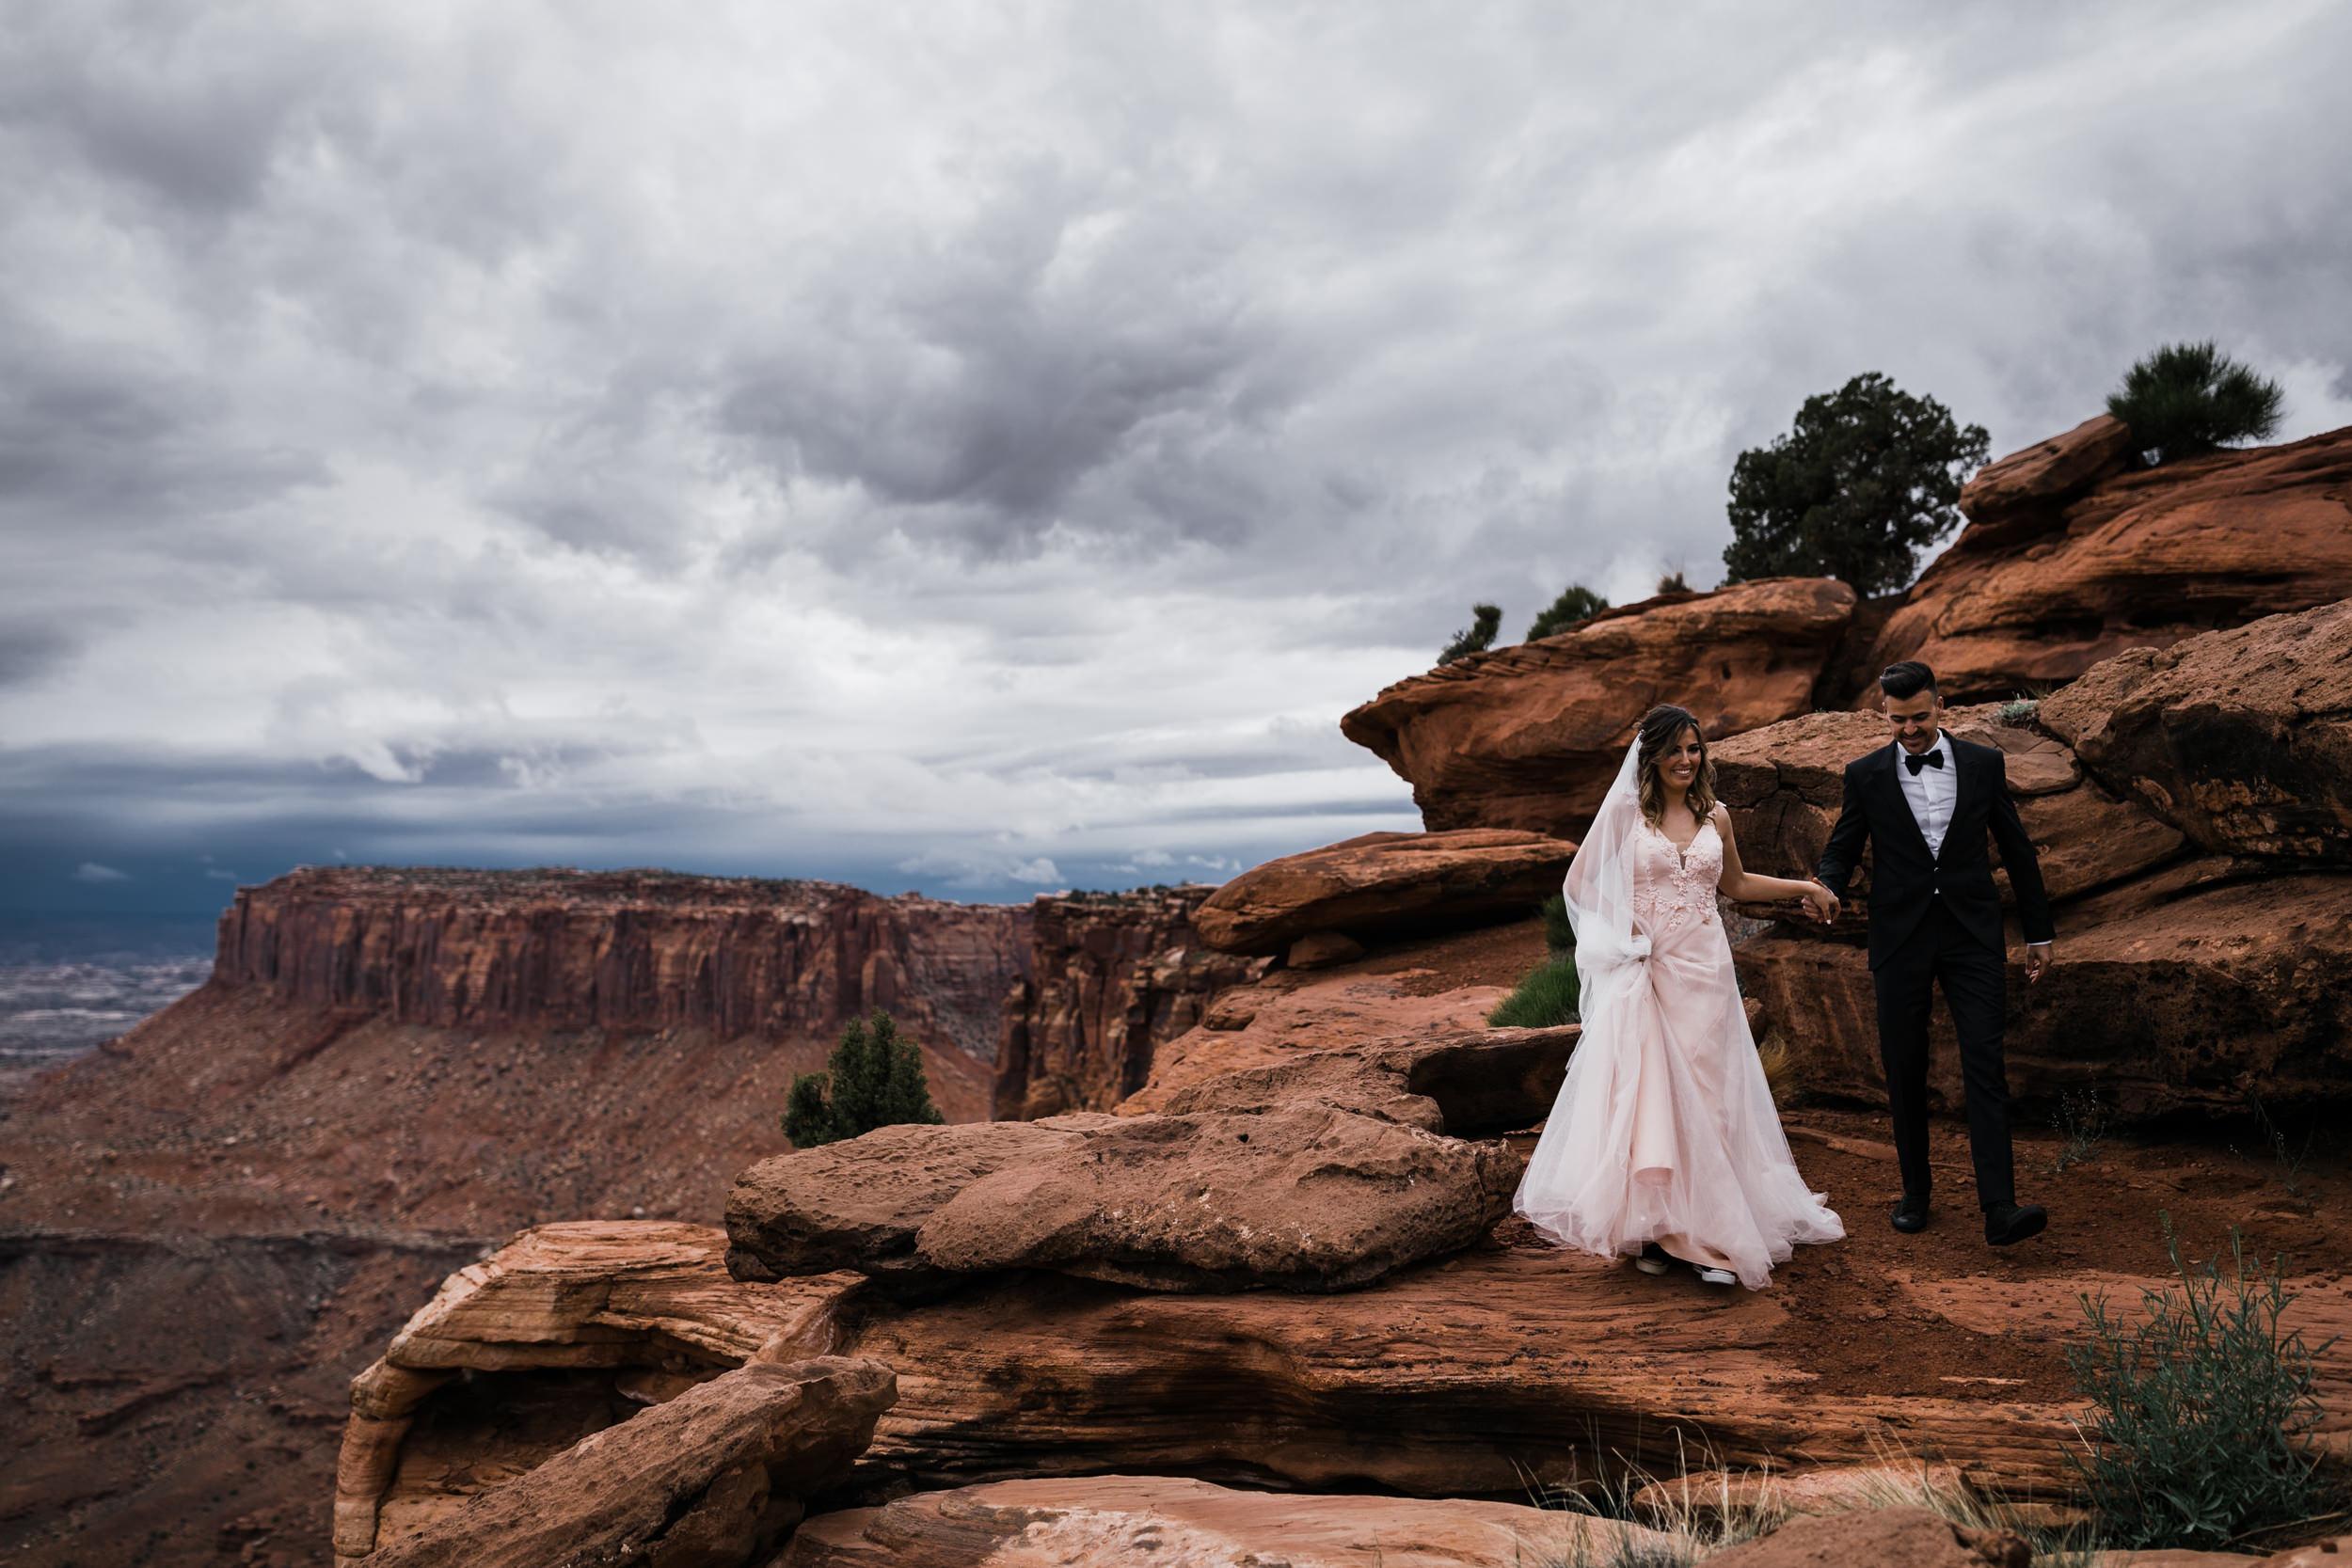 Hearnes-Elopement-Photography-Canyonlands-National-Park-Moab-Wedding-14.jpg